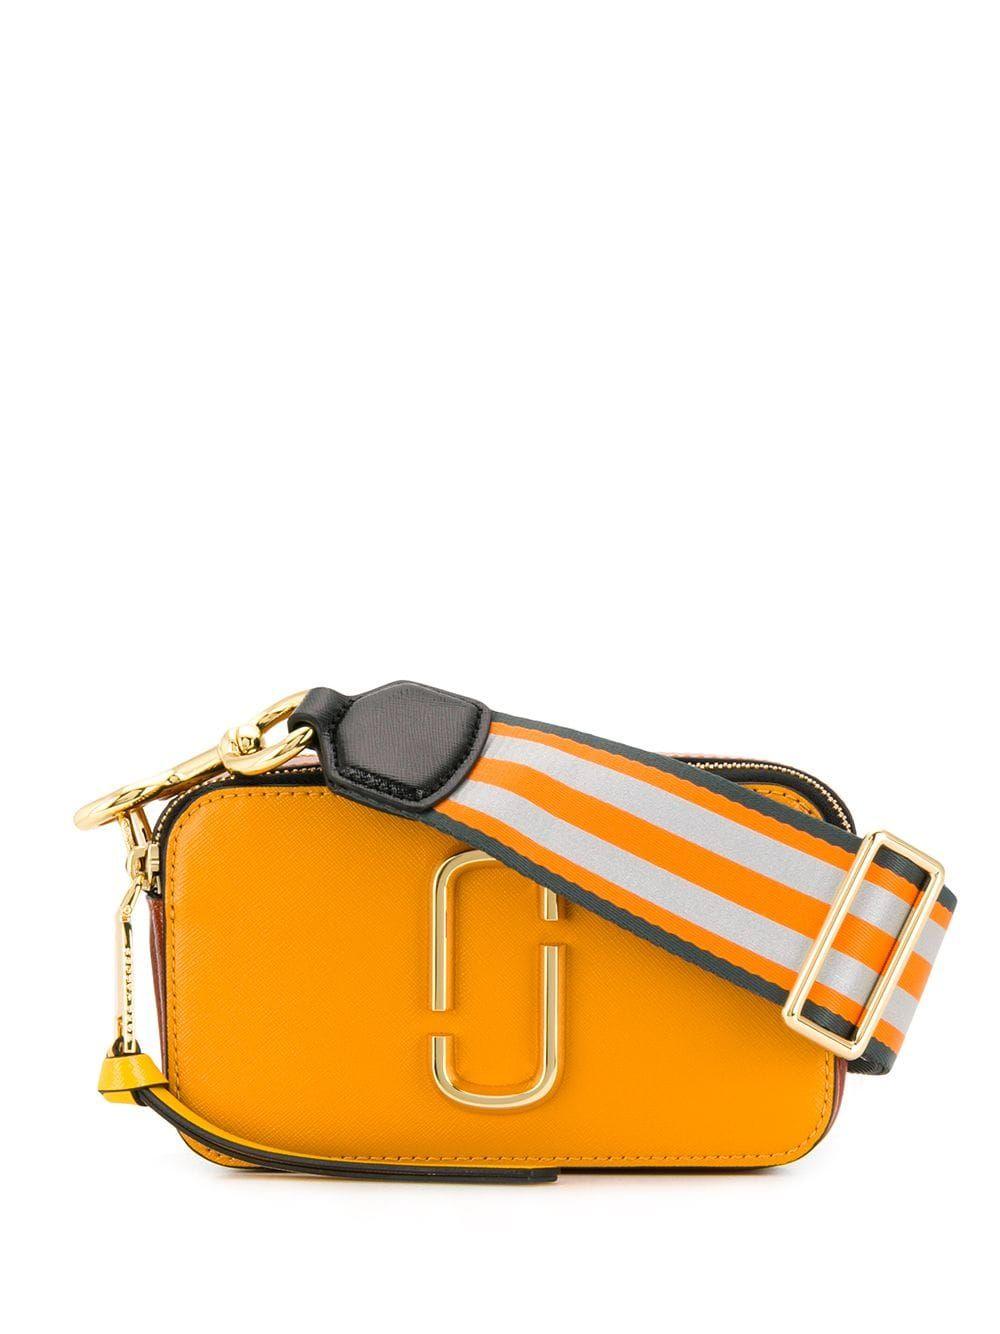 Marc Jacobs The Snapshot Camera Bag - Farfetch | Crossbody bag ...